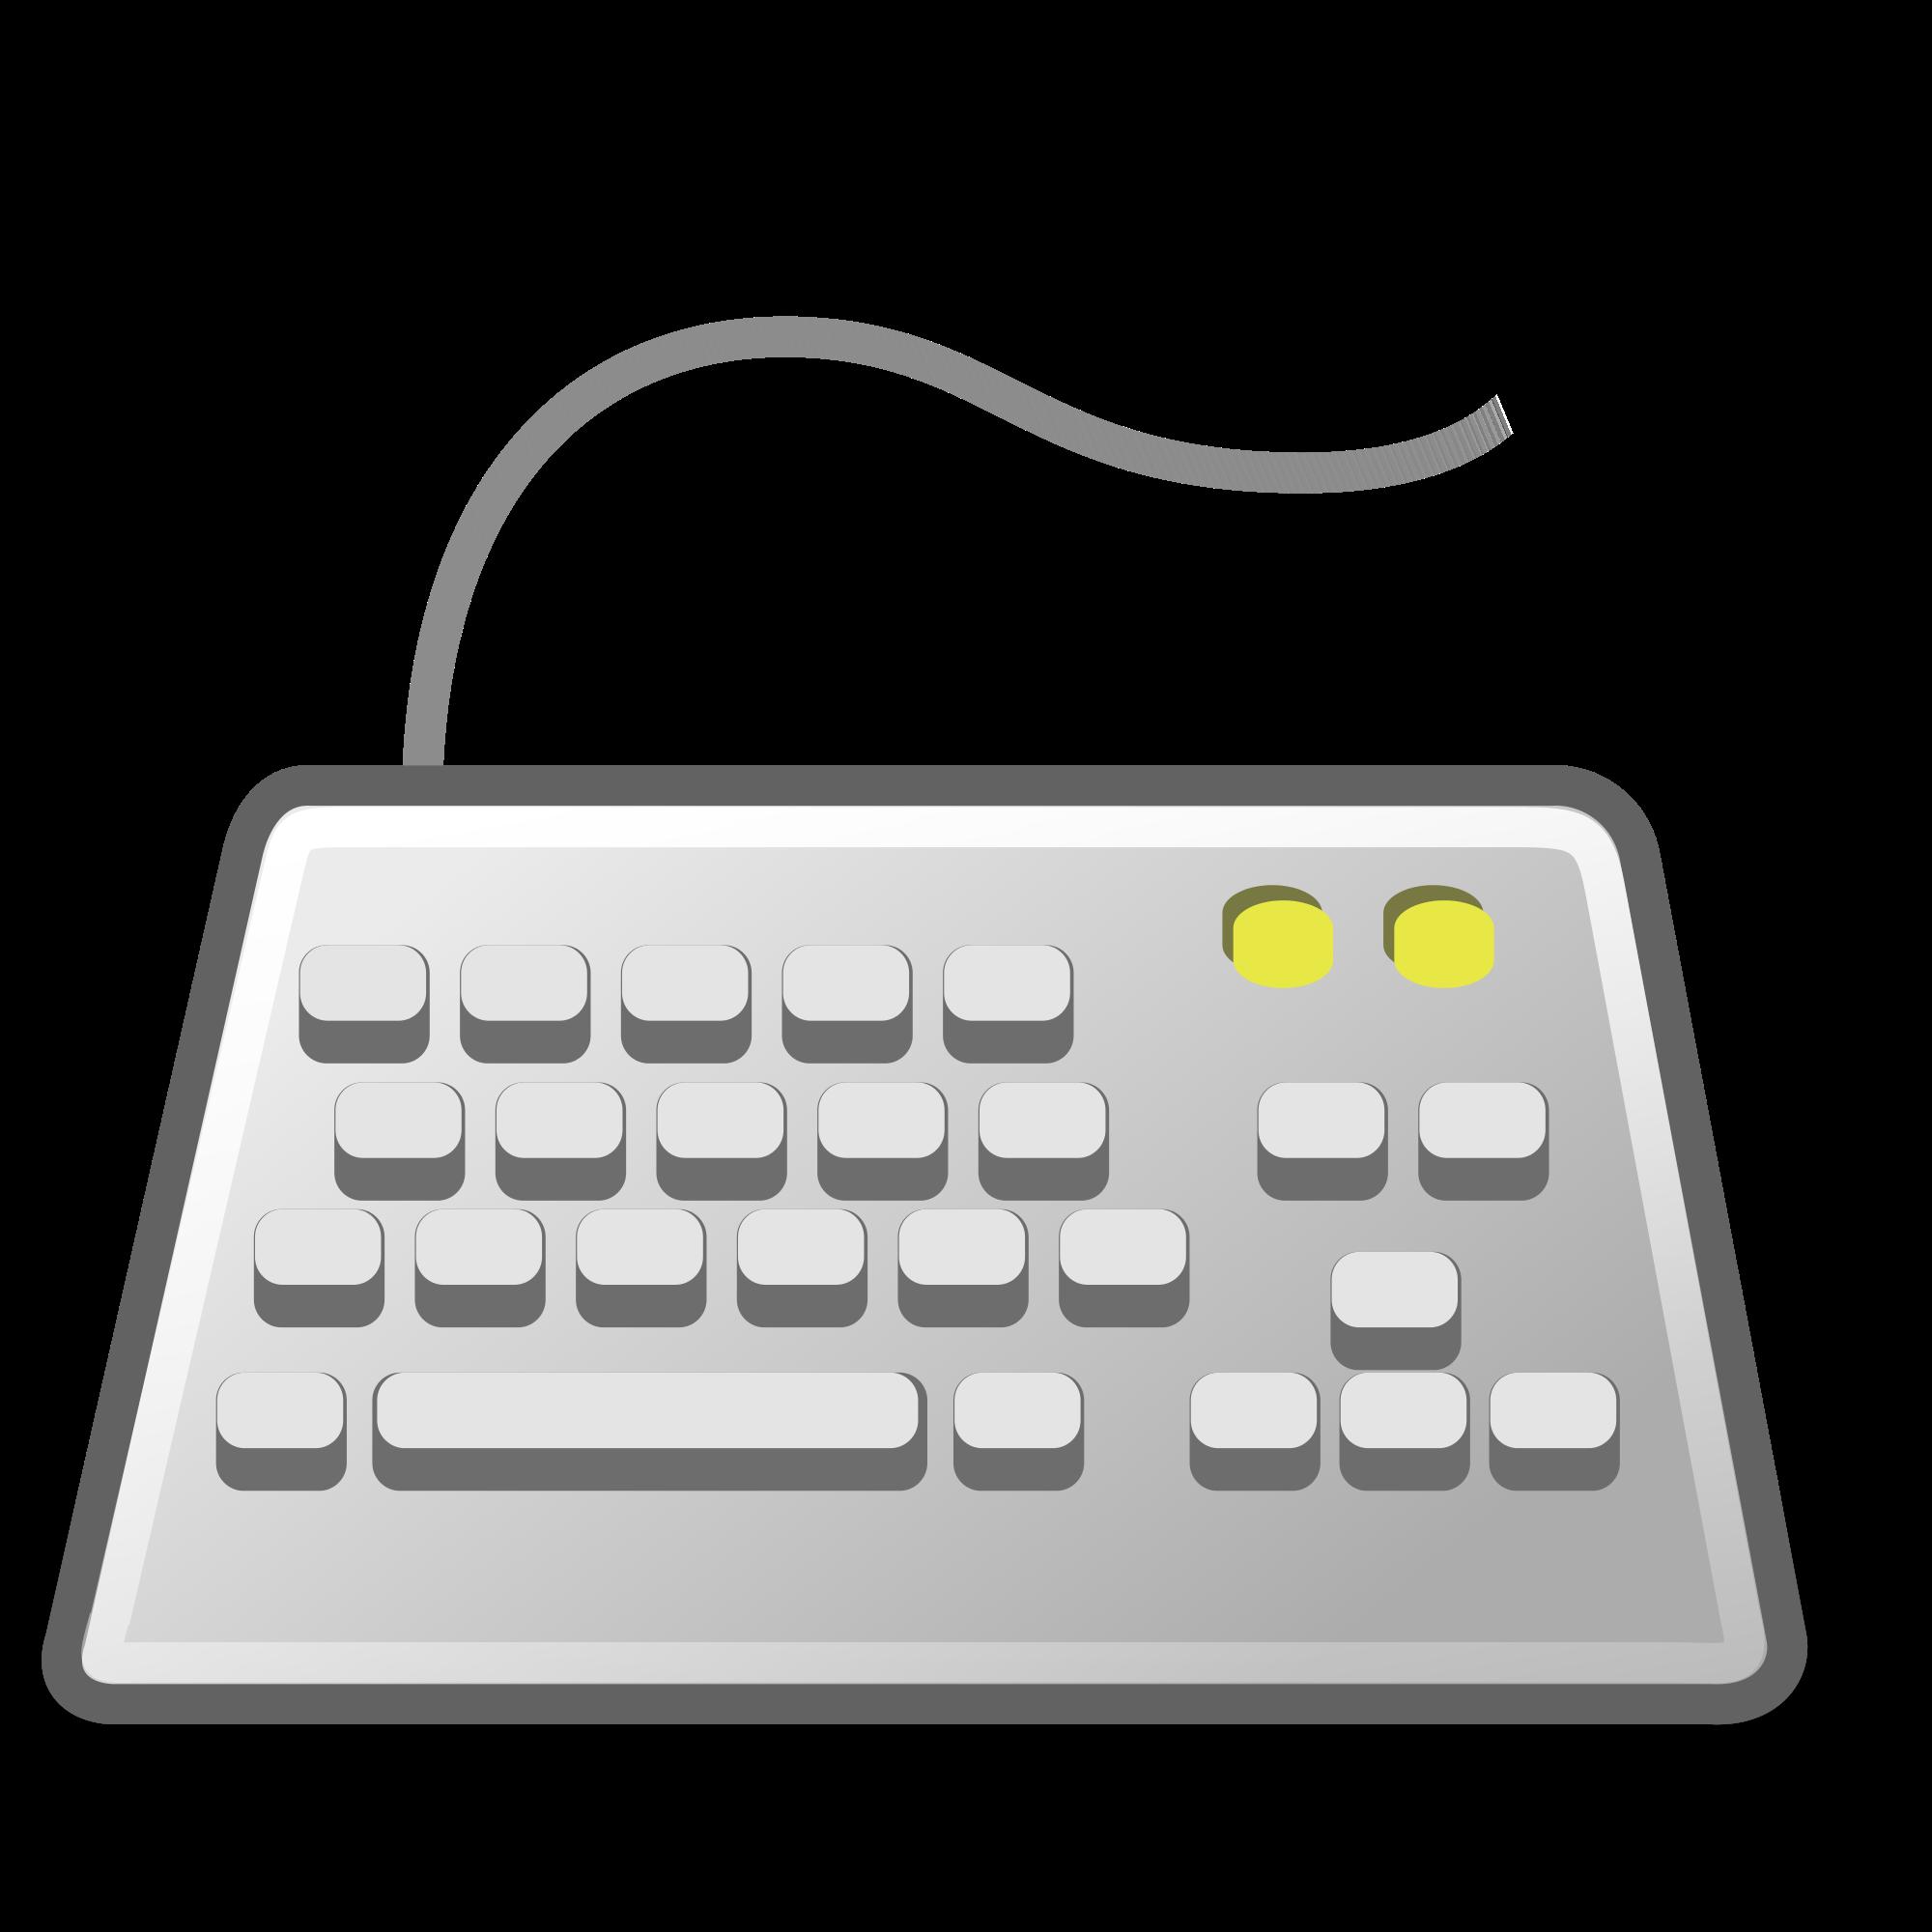 Keyboard clipart print. File input svg wikimedia